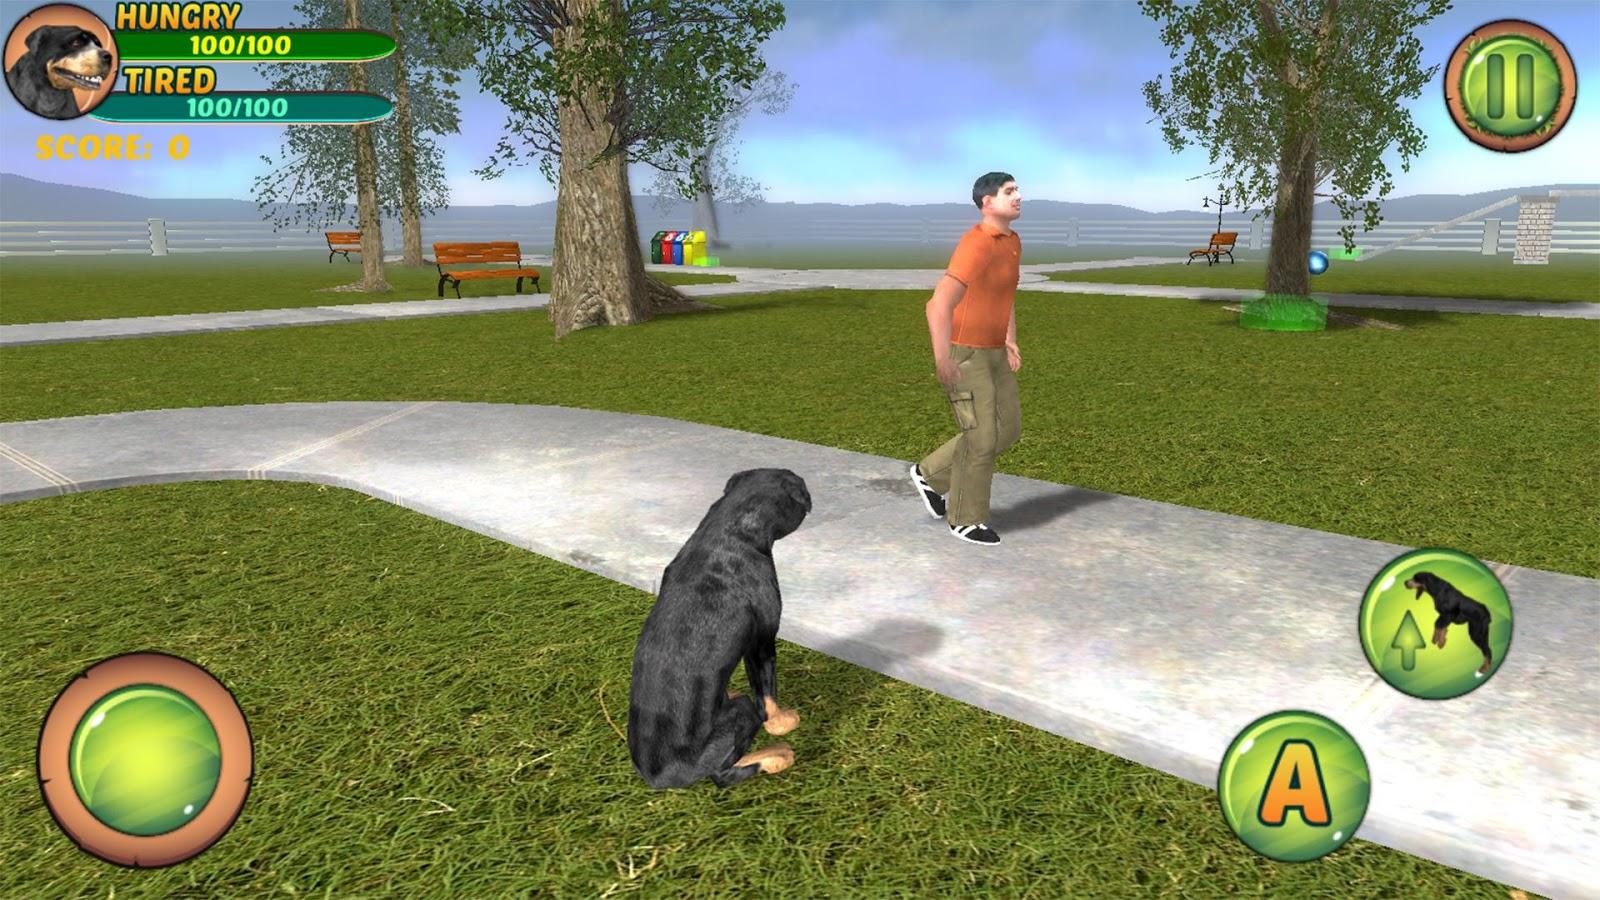 Rottweiler Dog Life Simulator 1 321 APK Download - Android